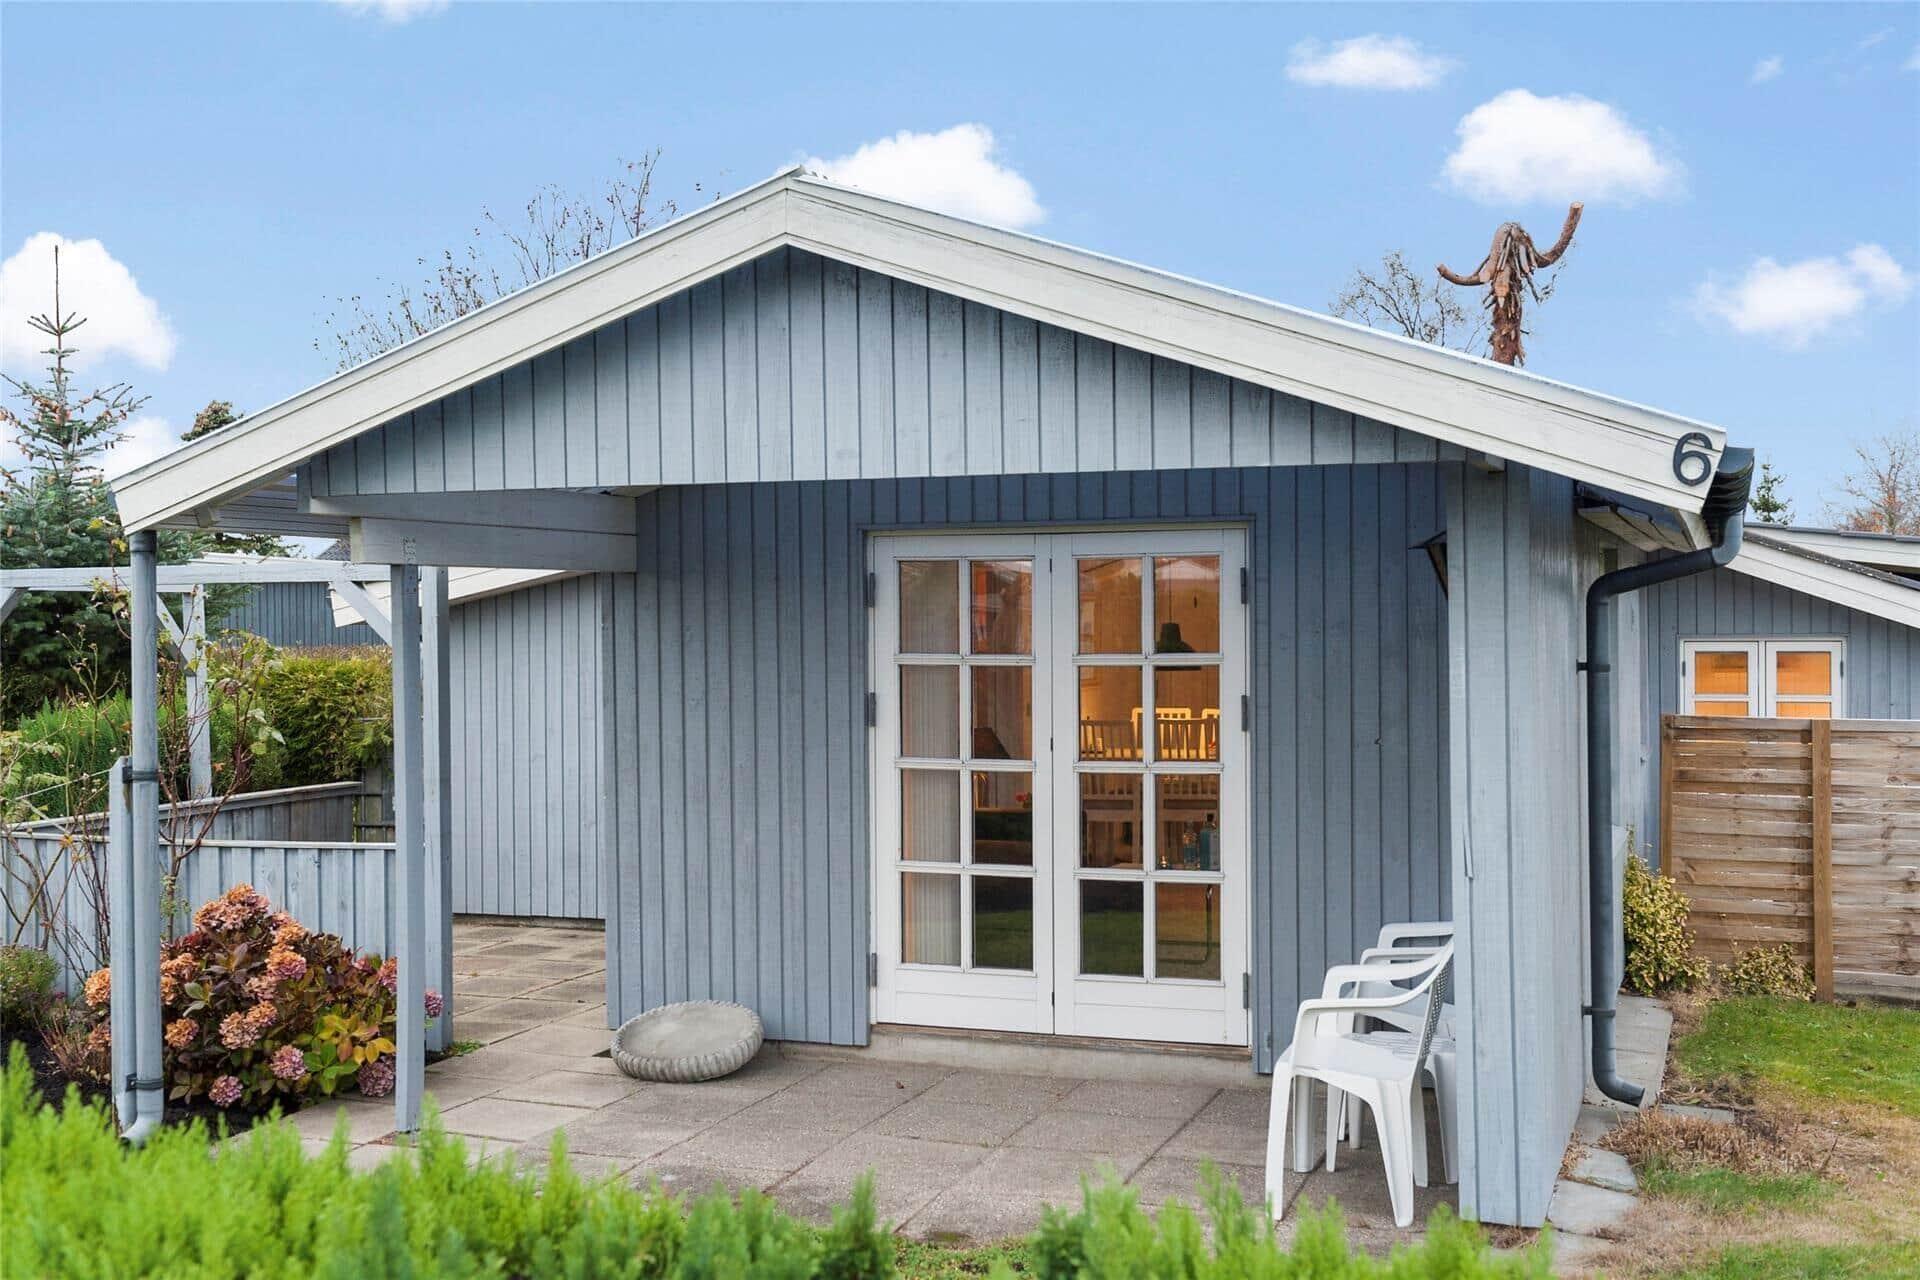 Bild 1-23 Ferienhaus 8526, Pilevej 6, DK - 8500 Grenaa